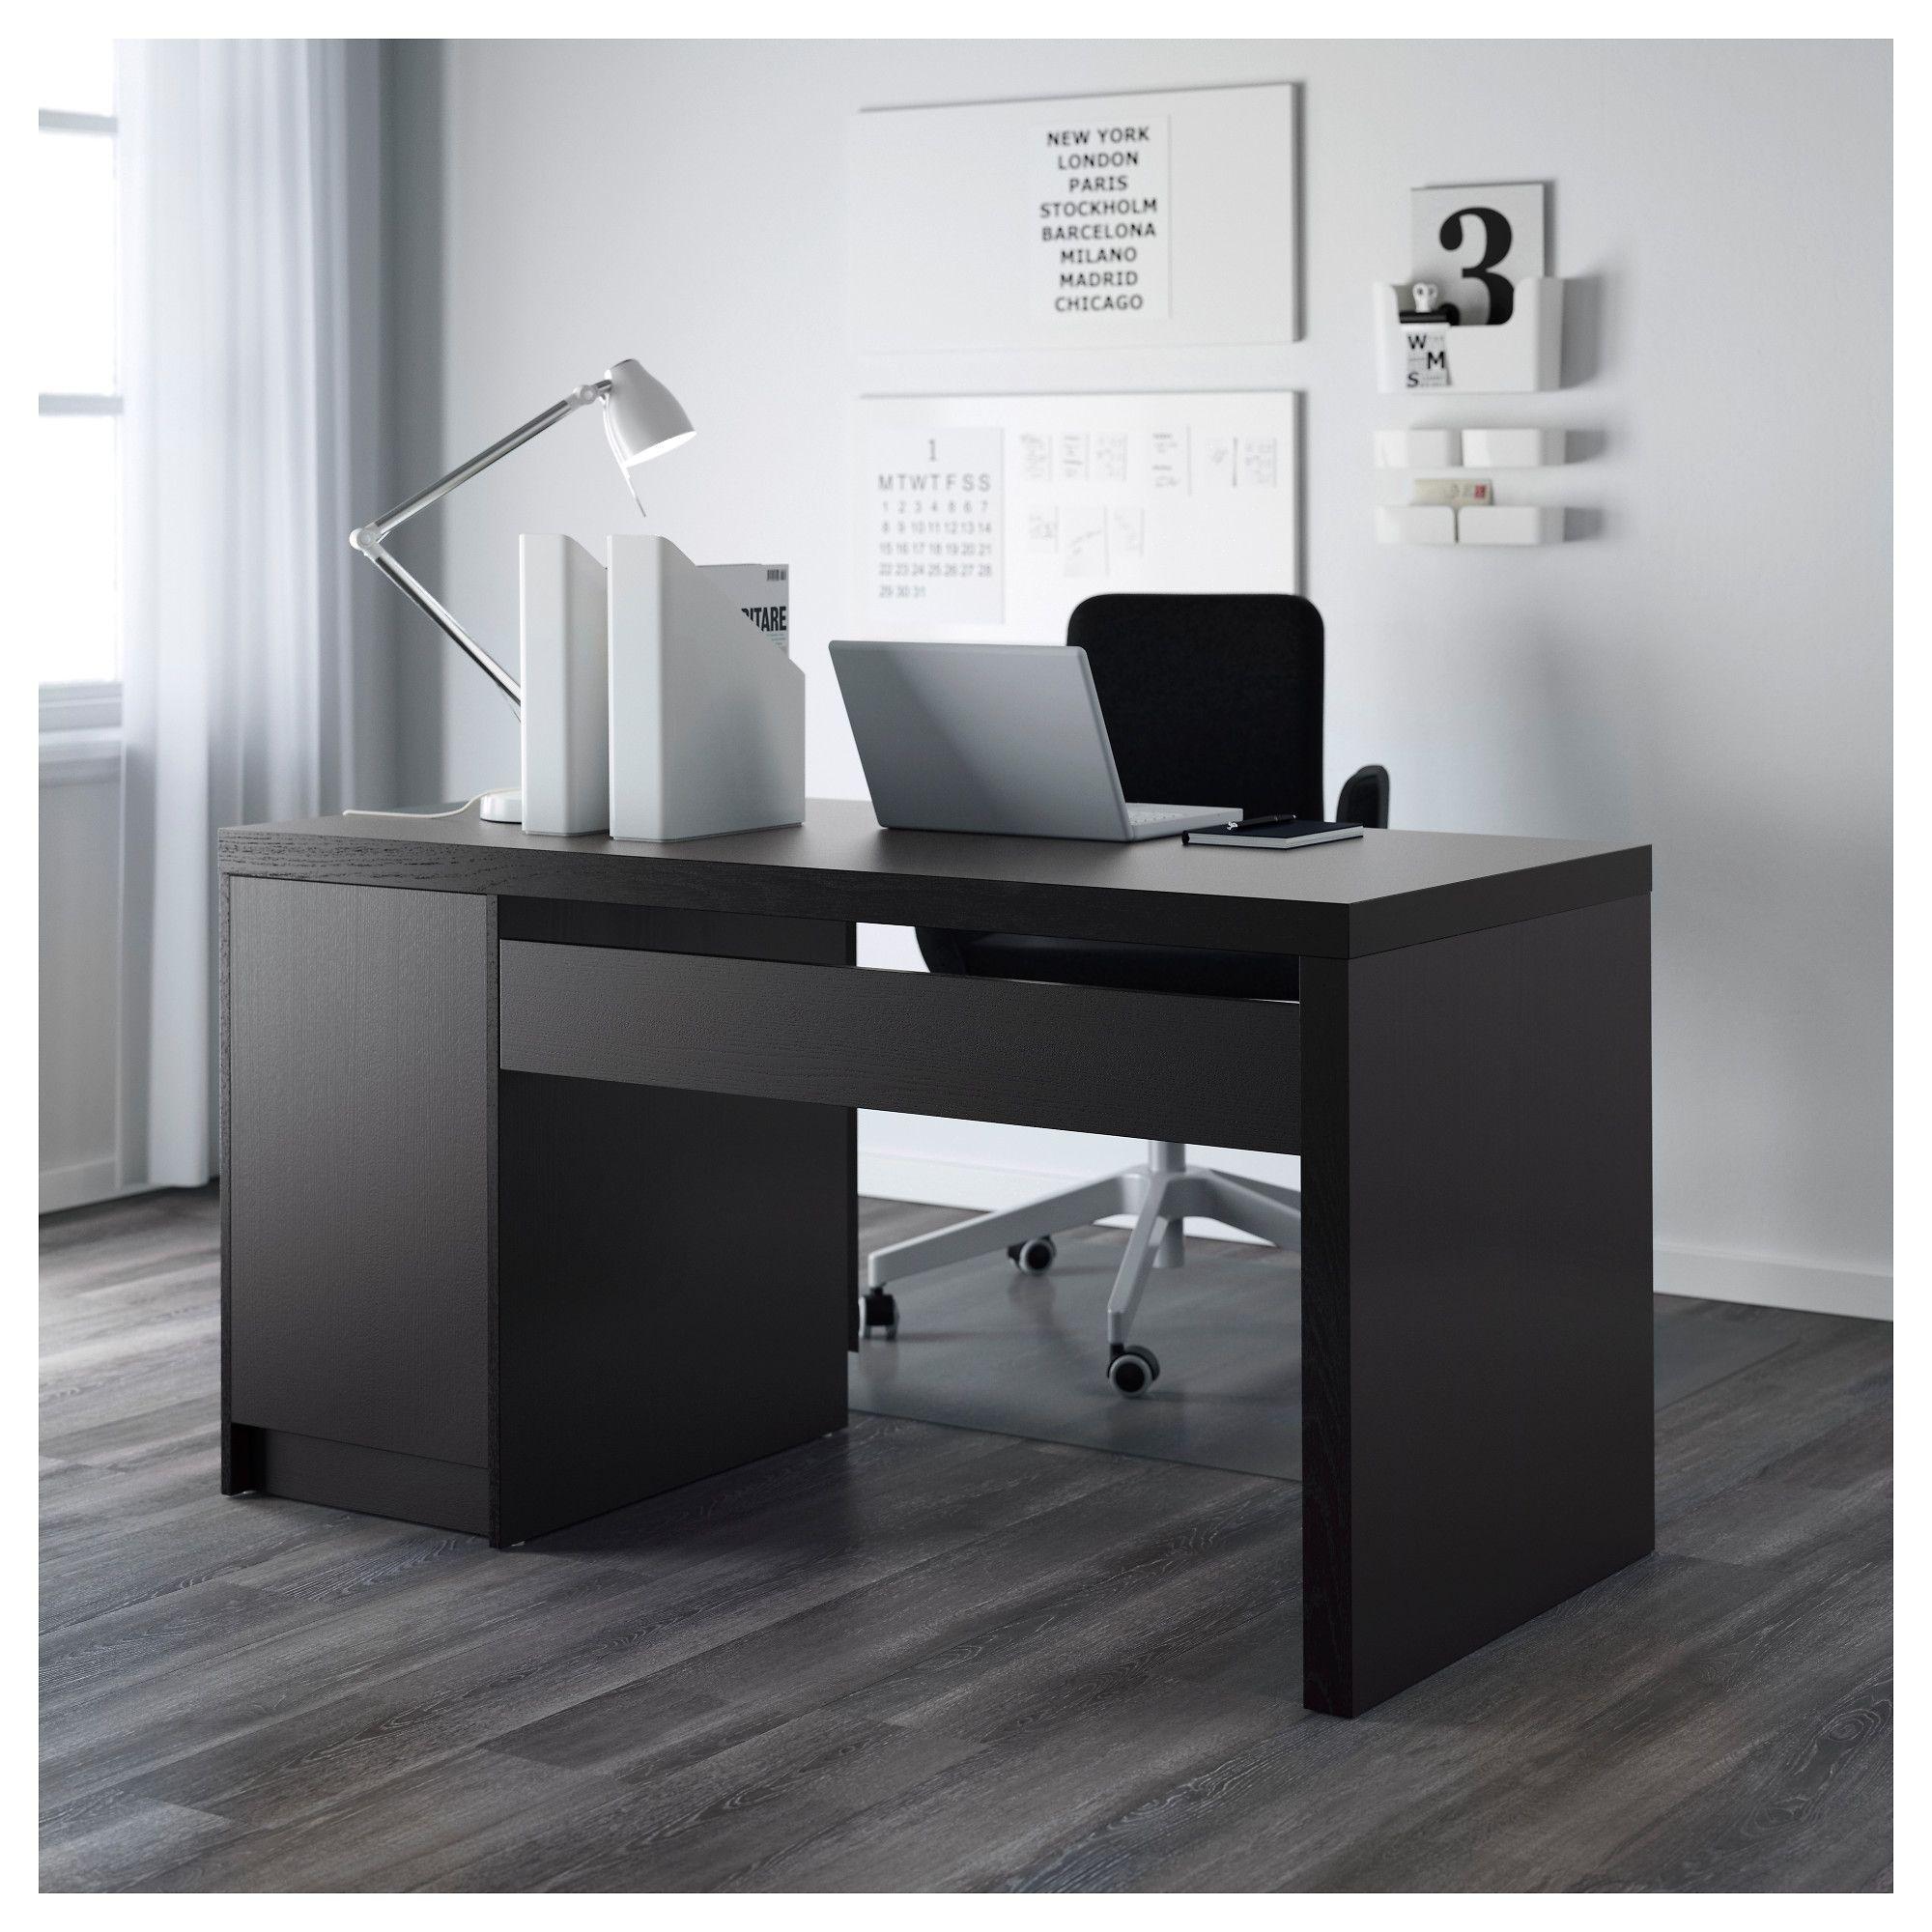 Ikea Malm Desk Black Brown In 2019 Products Ikea